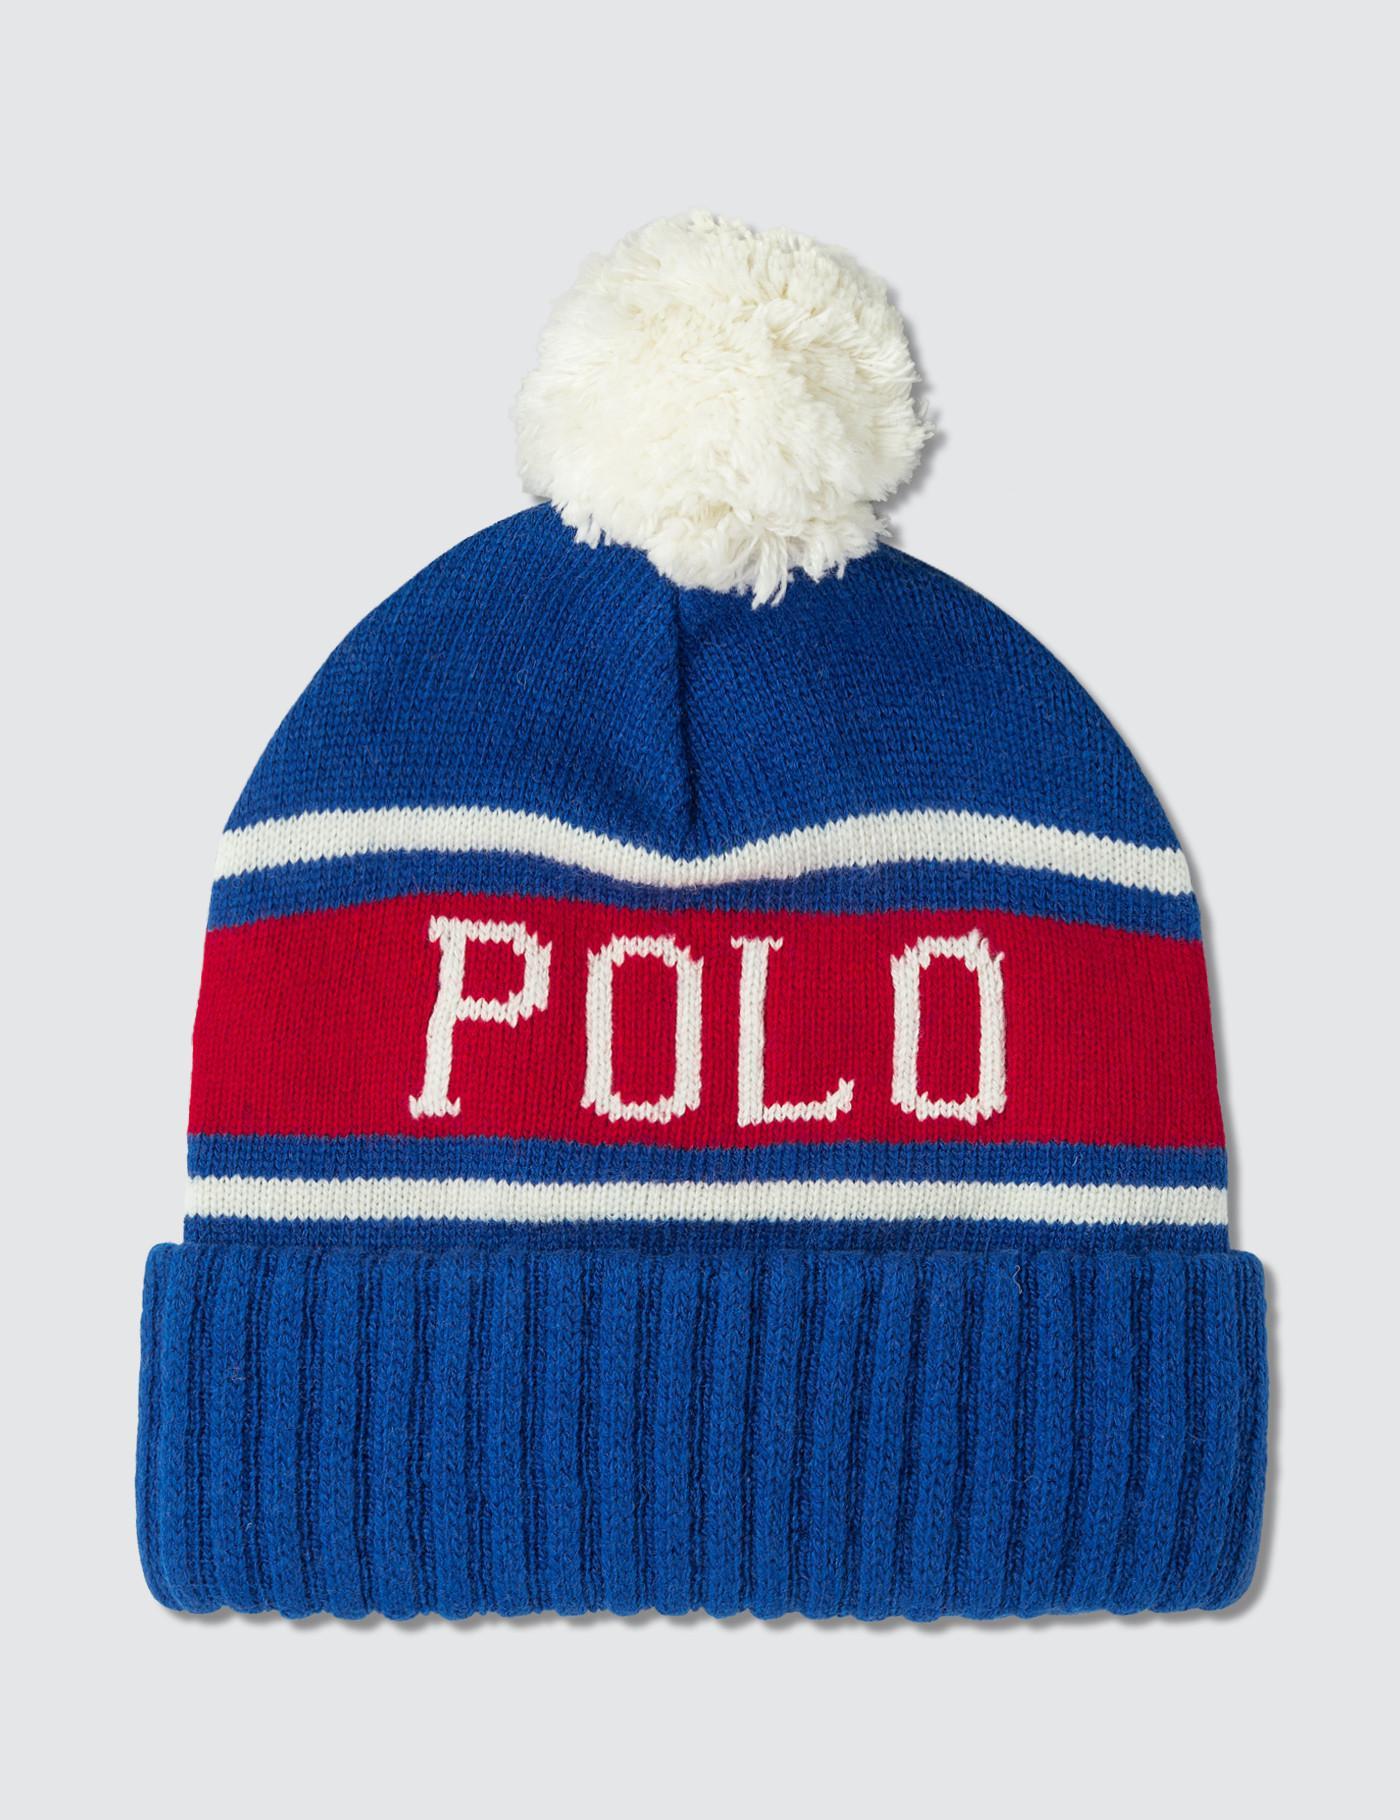 Polo Ralph Lauren Stadium Hat in Blue for Men - Lyst a8596241de5c